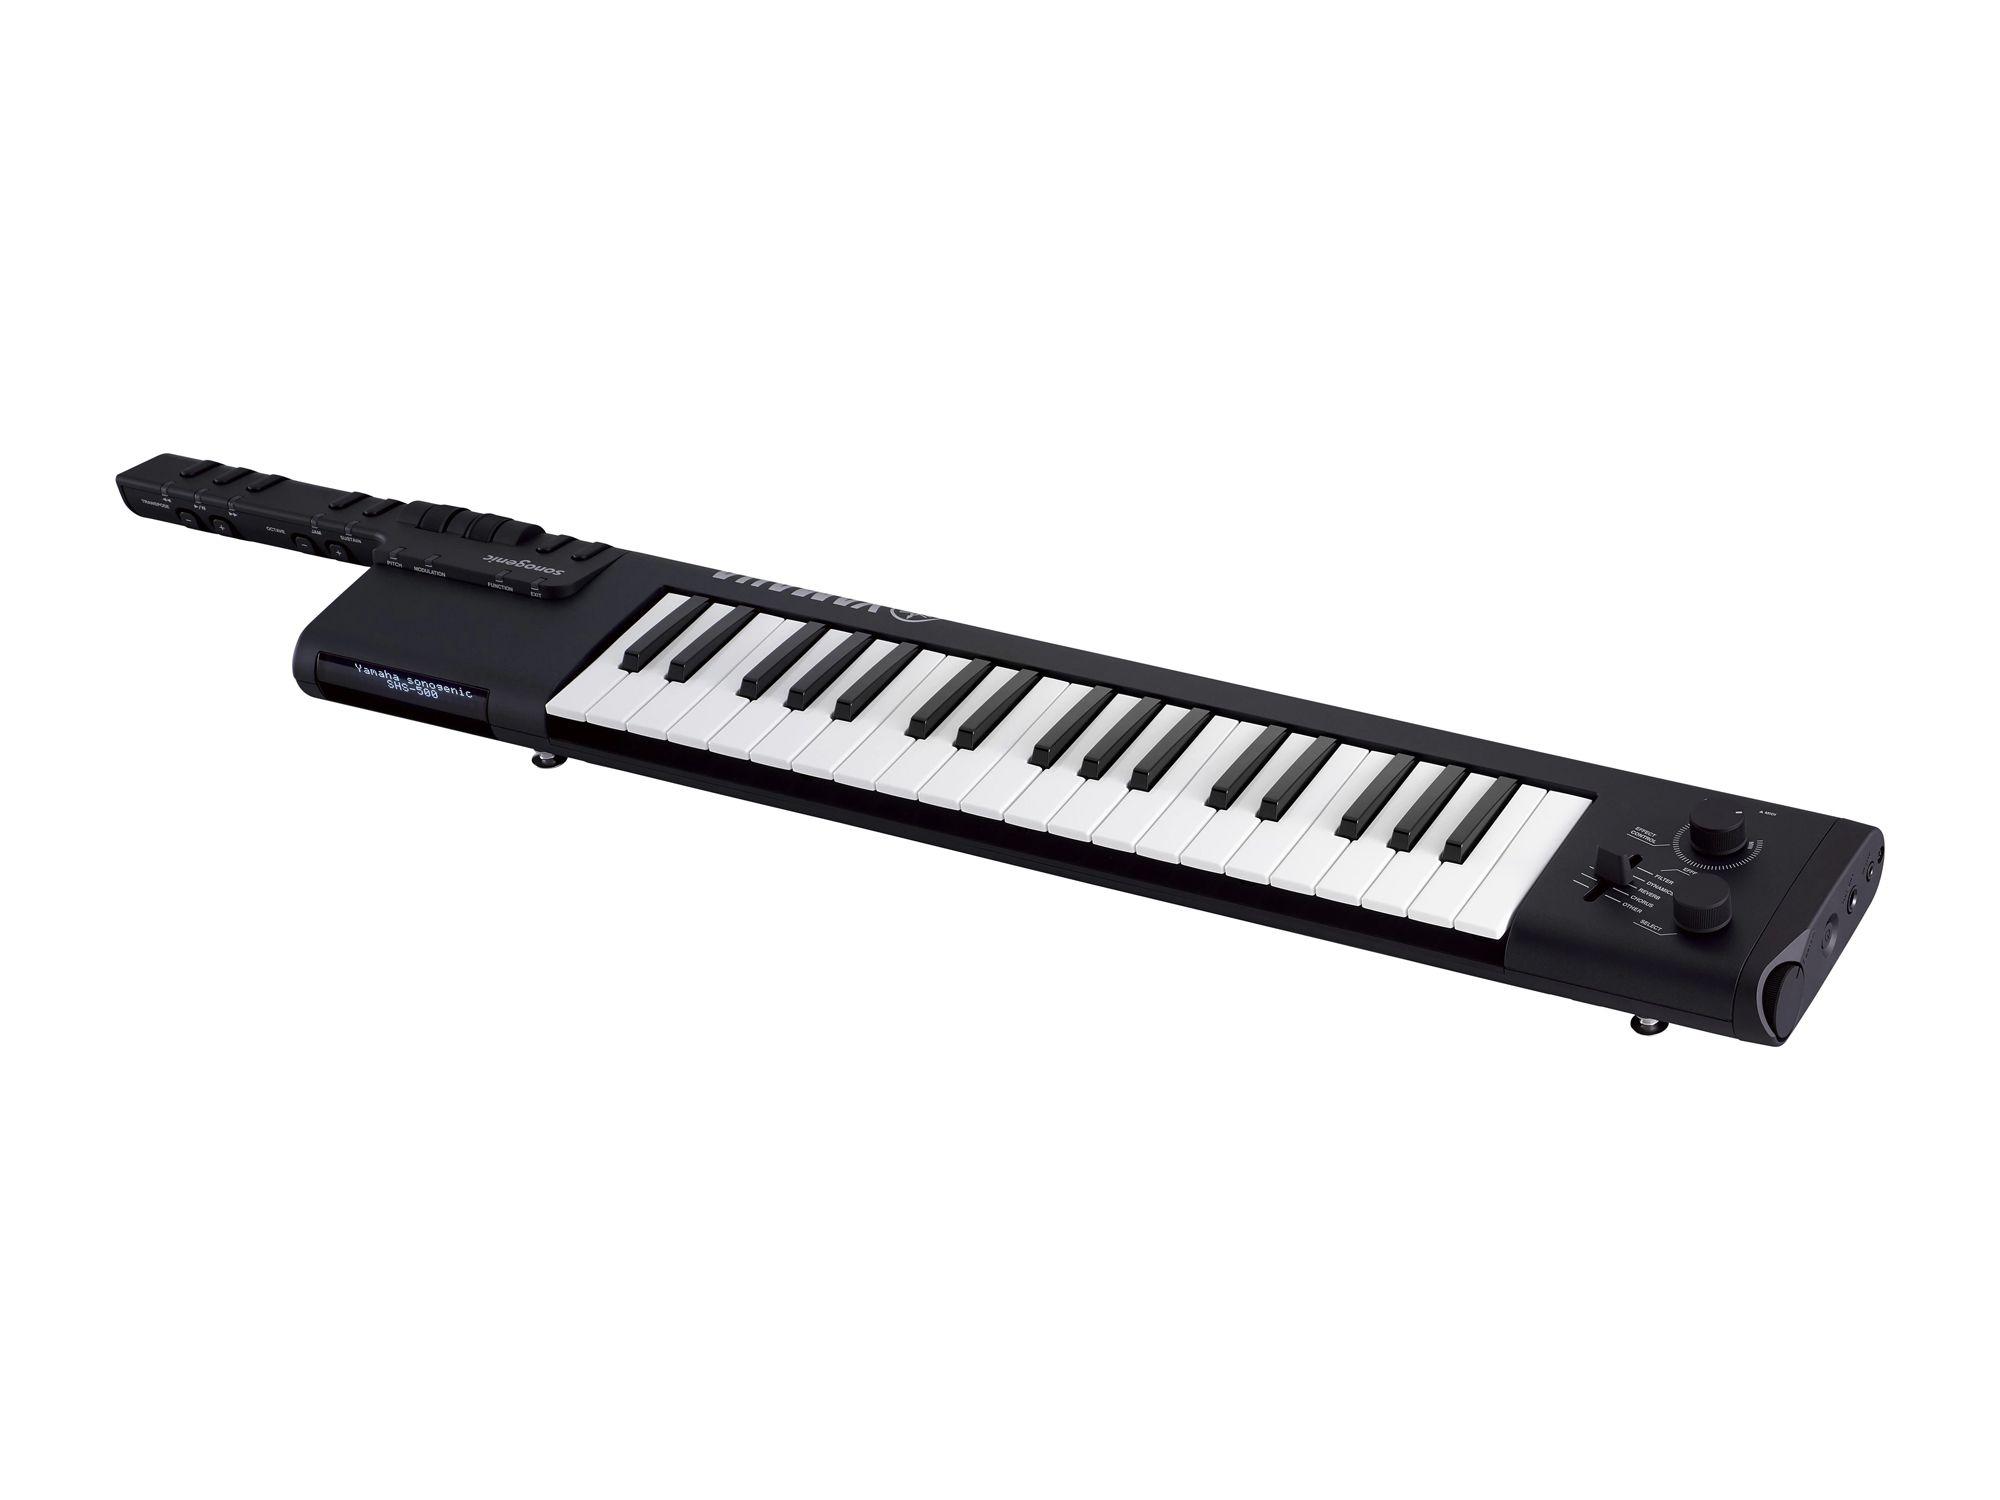 Teclado Yamaha SHS-550 - Black